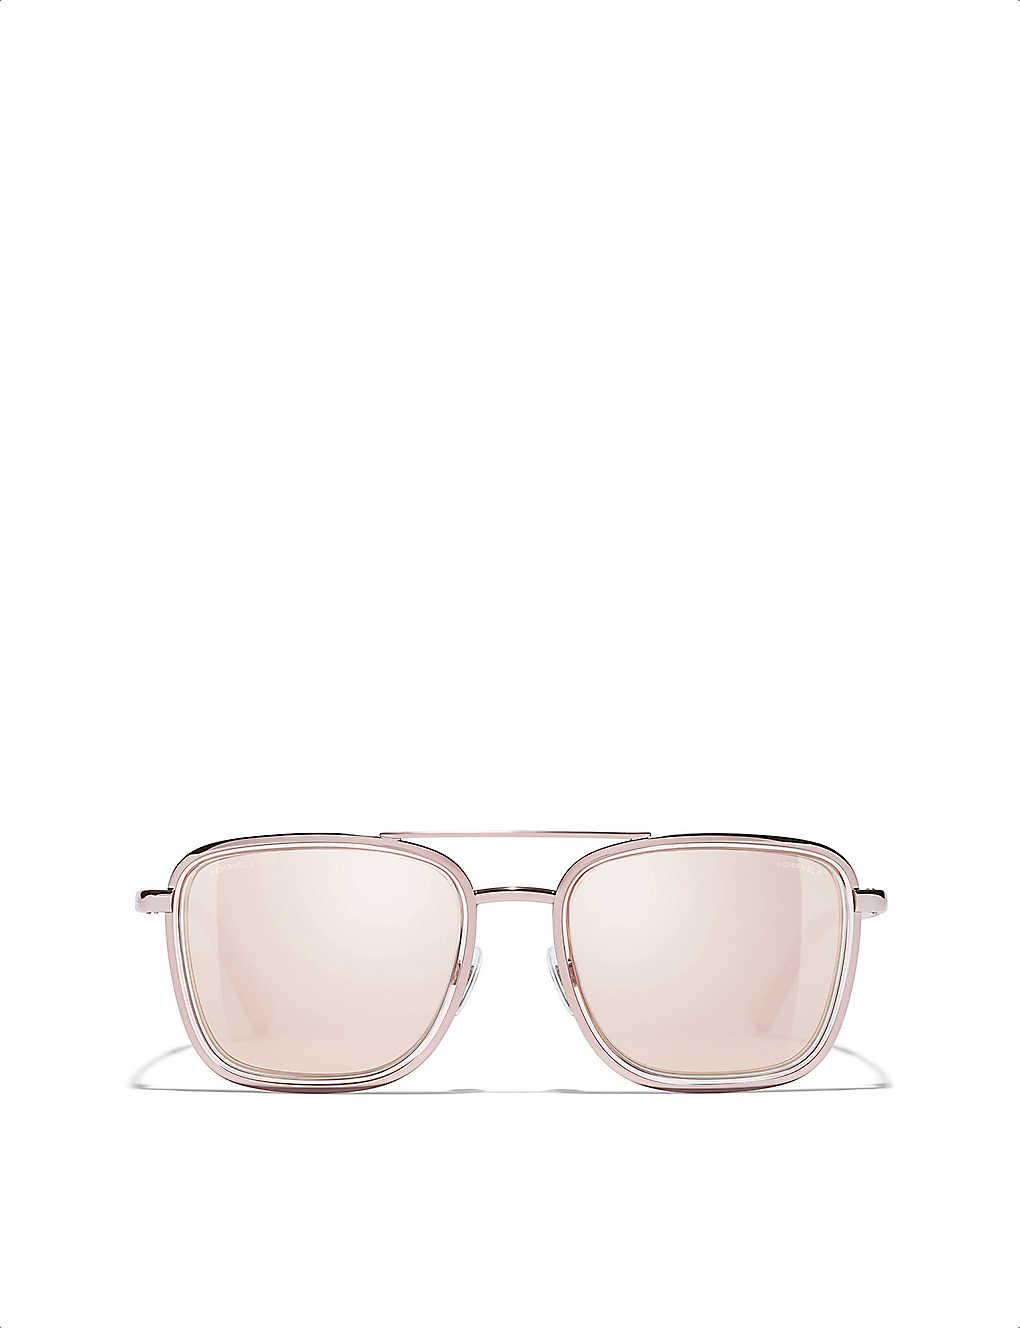 403c0d7a0 CHANEL - 18-carat pink-gold plated metal sunglasses | Selfridges.com